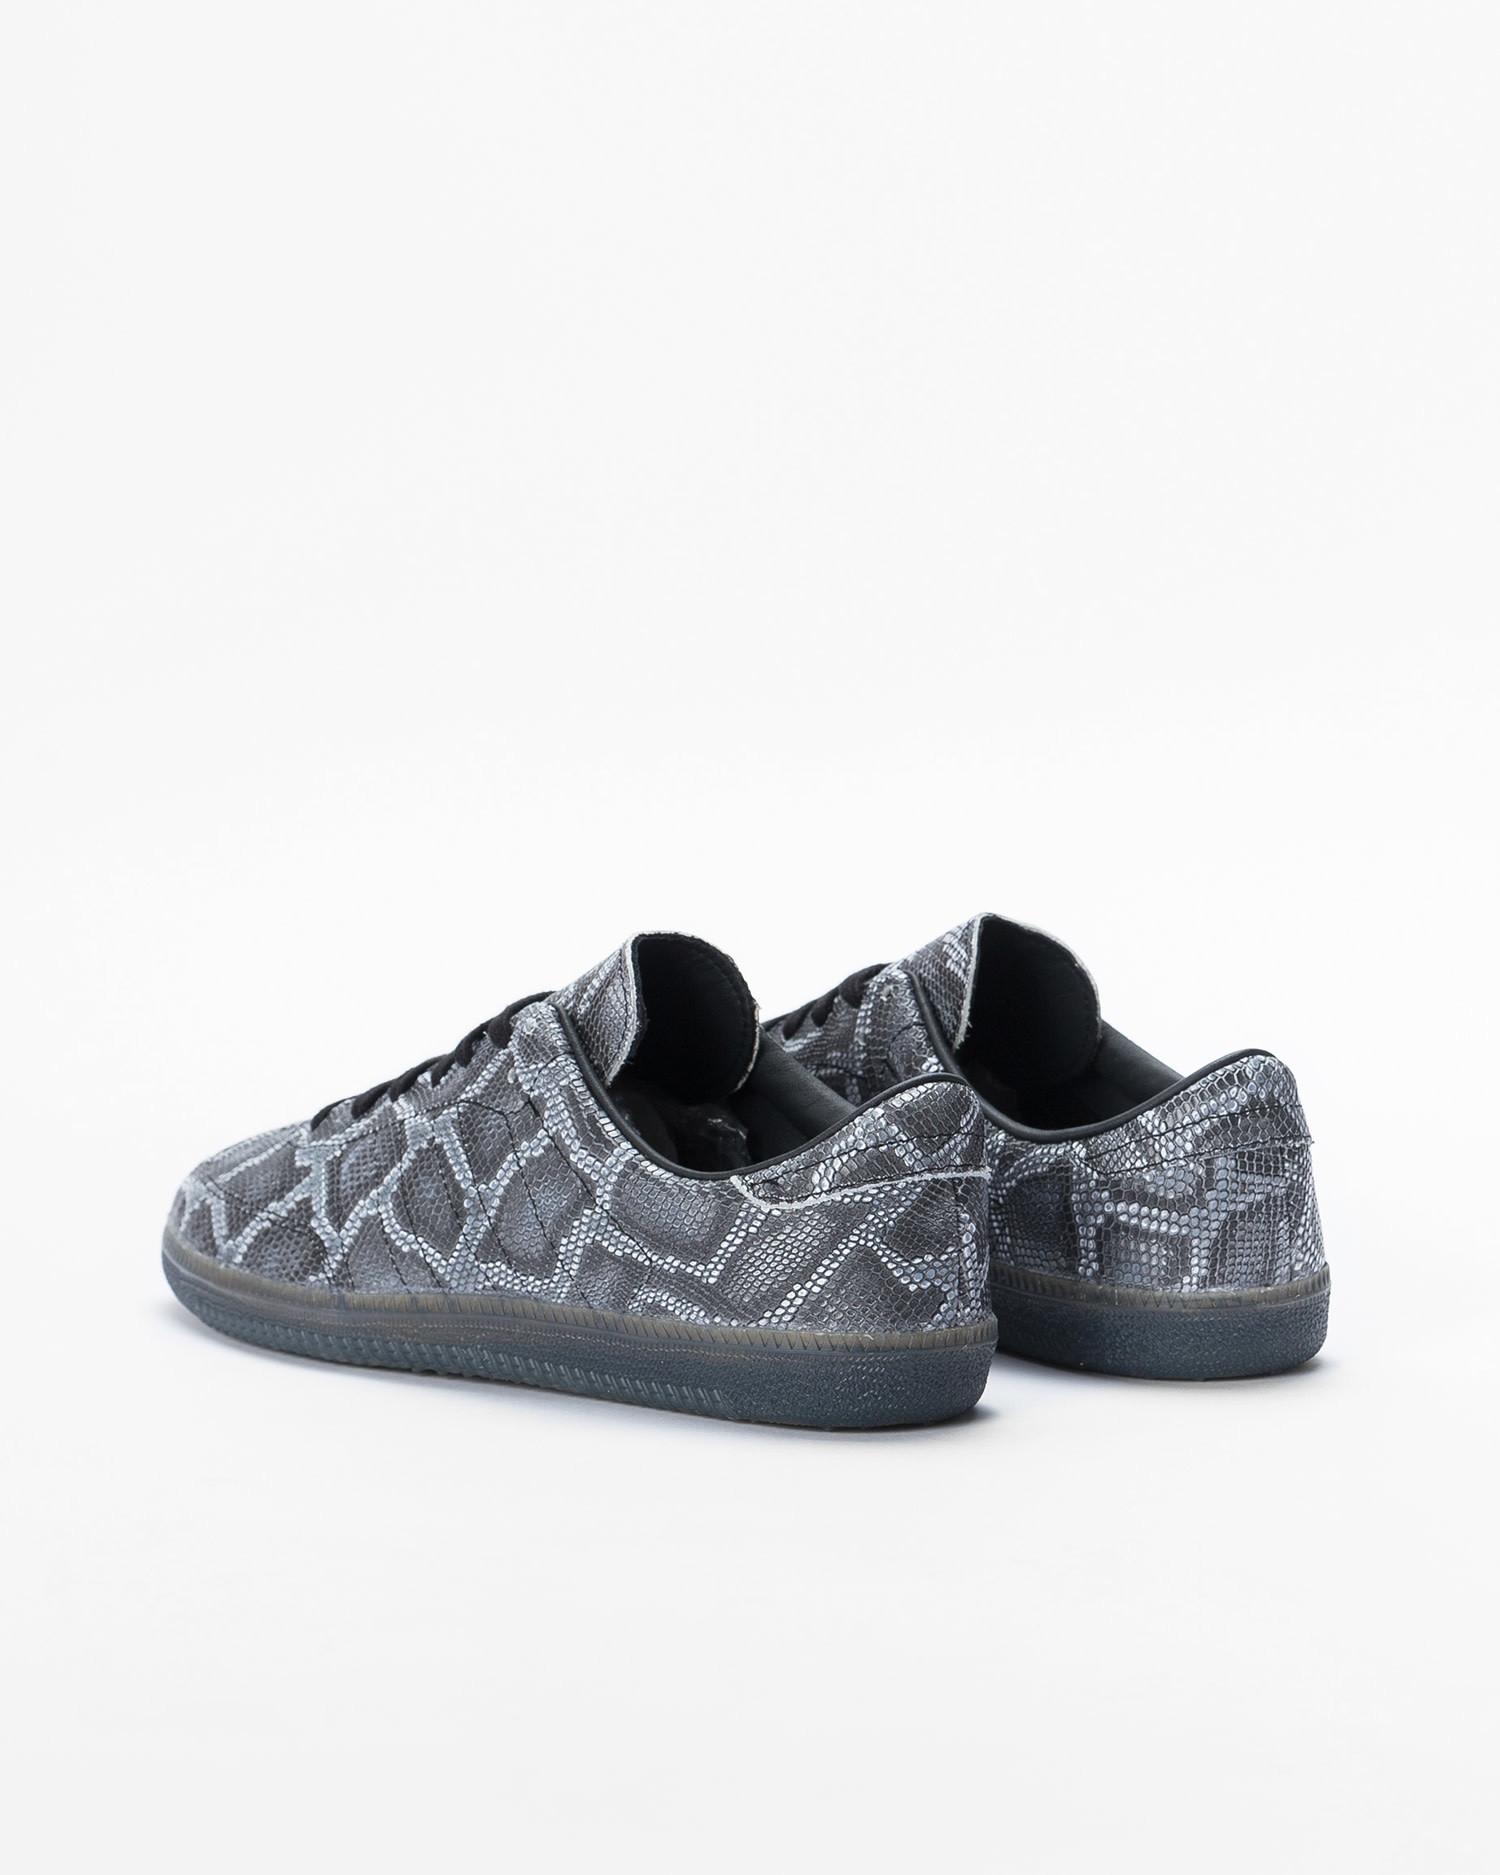 Adidas Samba Decon X Jason Dill Supcol/Cblack/Goldmt